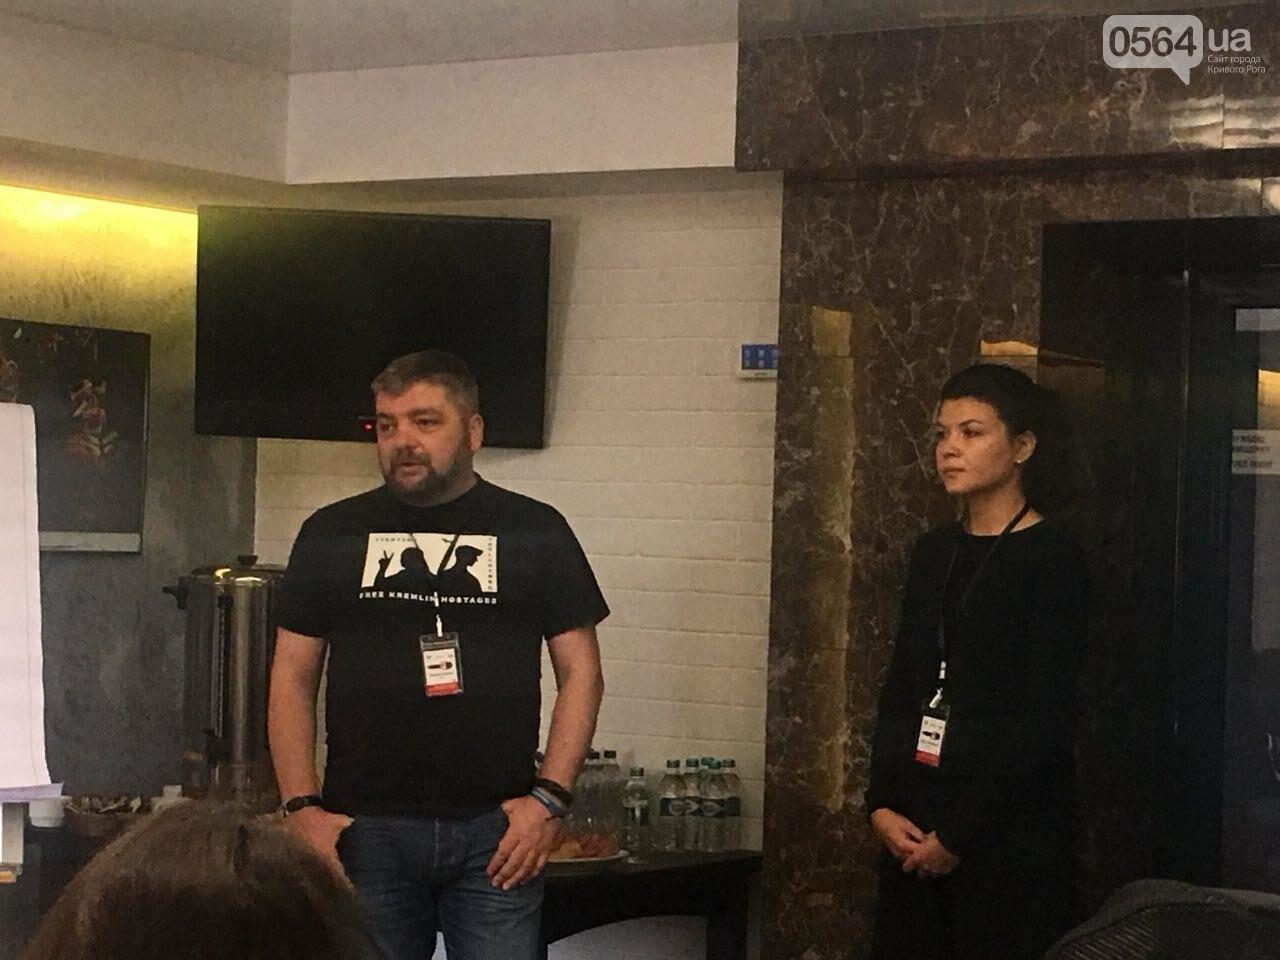 На тренинге о ВИЧ и медреформе криворожским журналистам рассказали о дискриминации и стереотипах, - ФОТО , фото-6